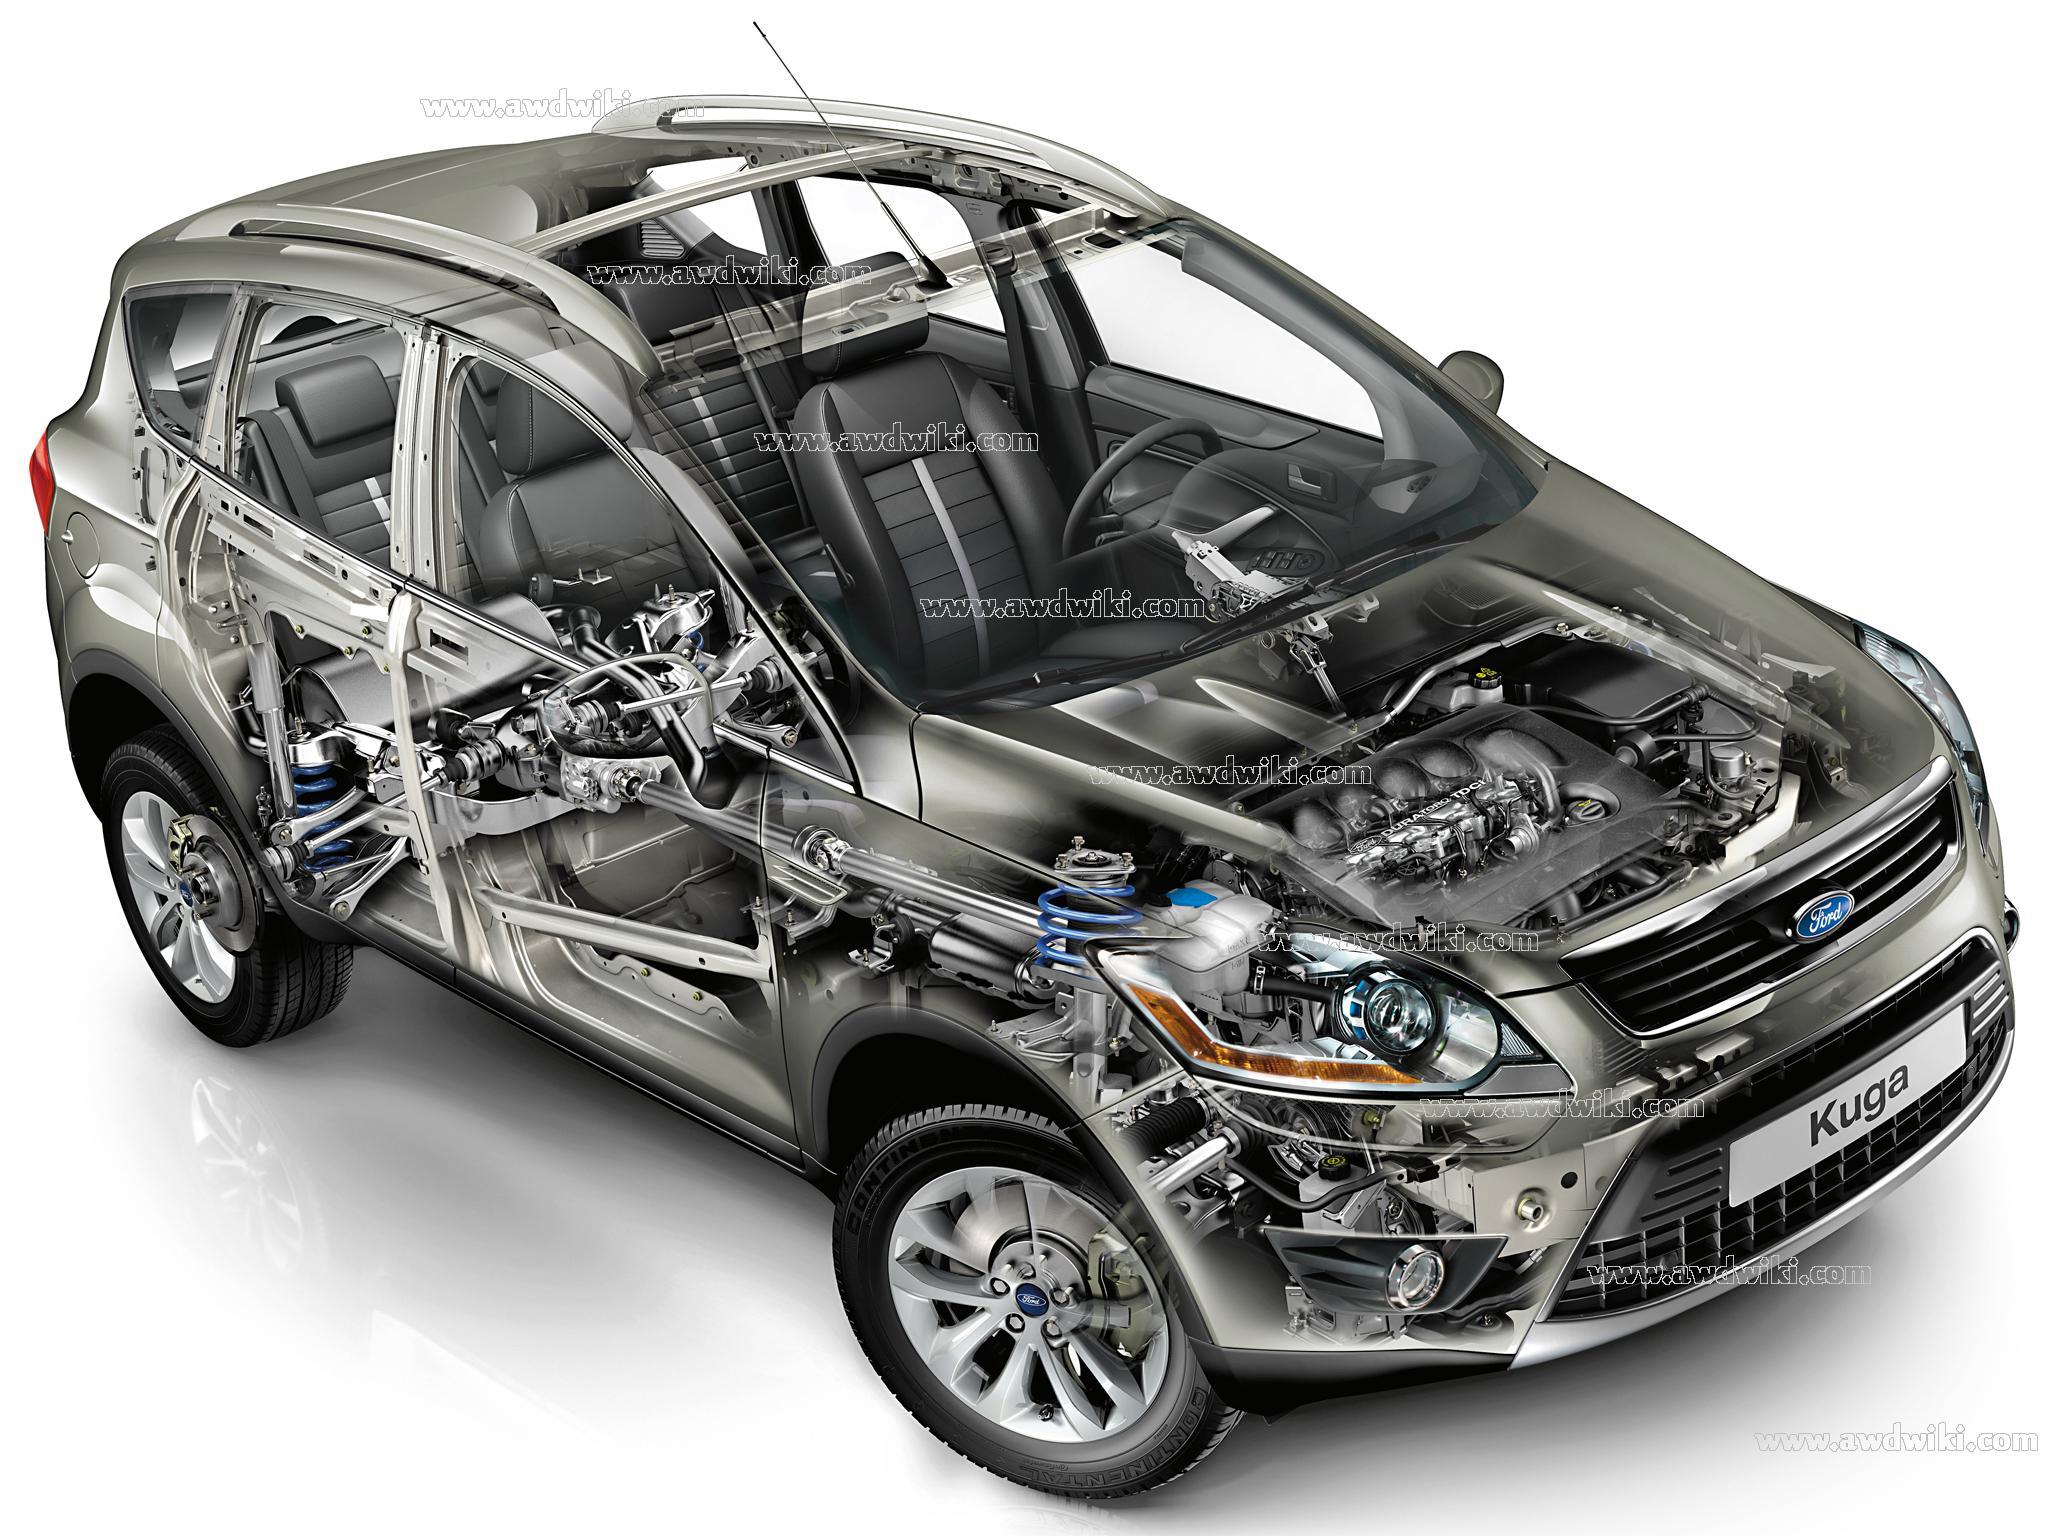 Ford kuga transmission